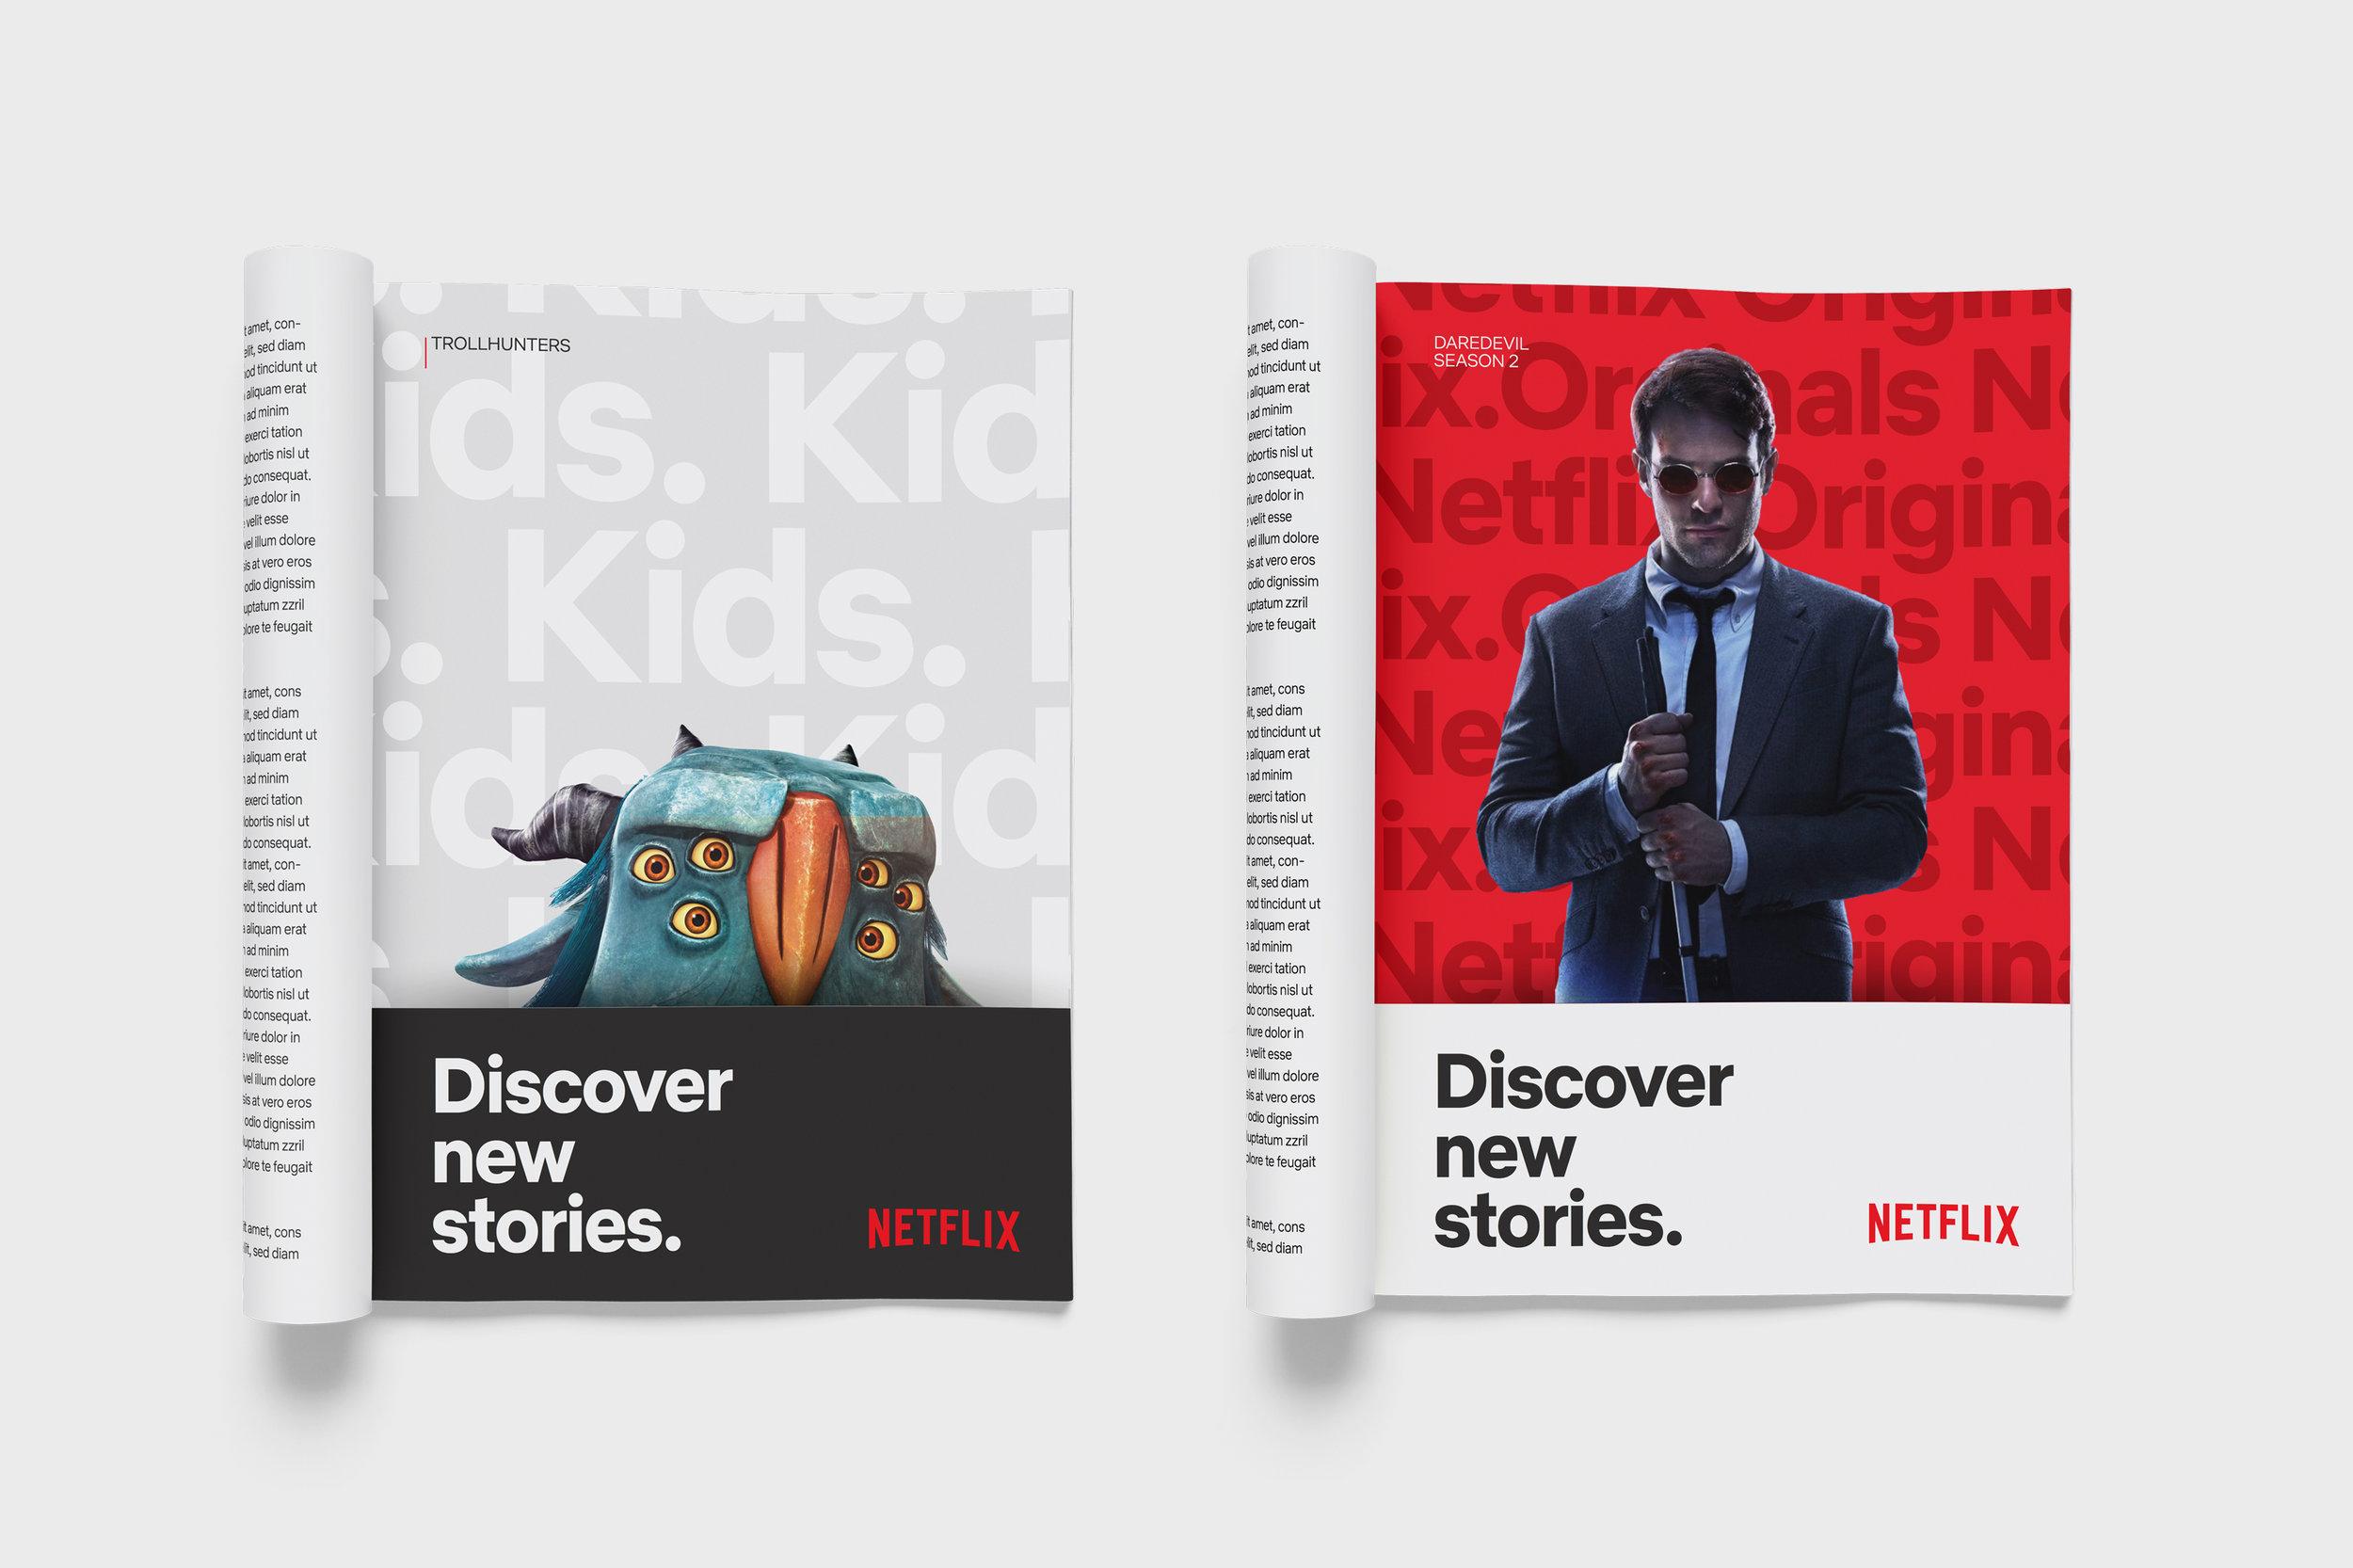 Netflix_MagazineAds.jpg